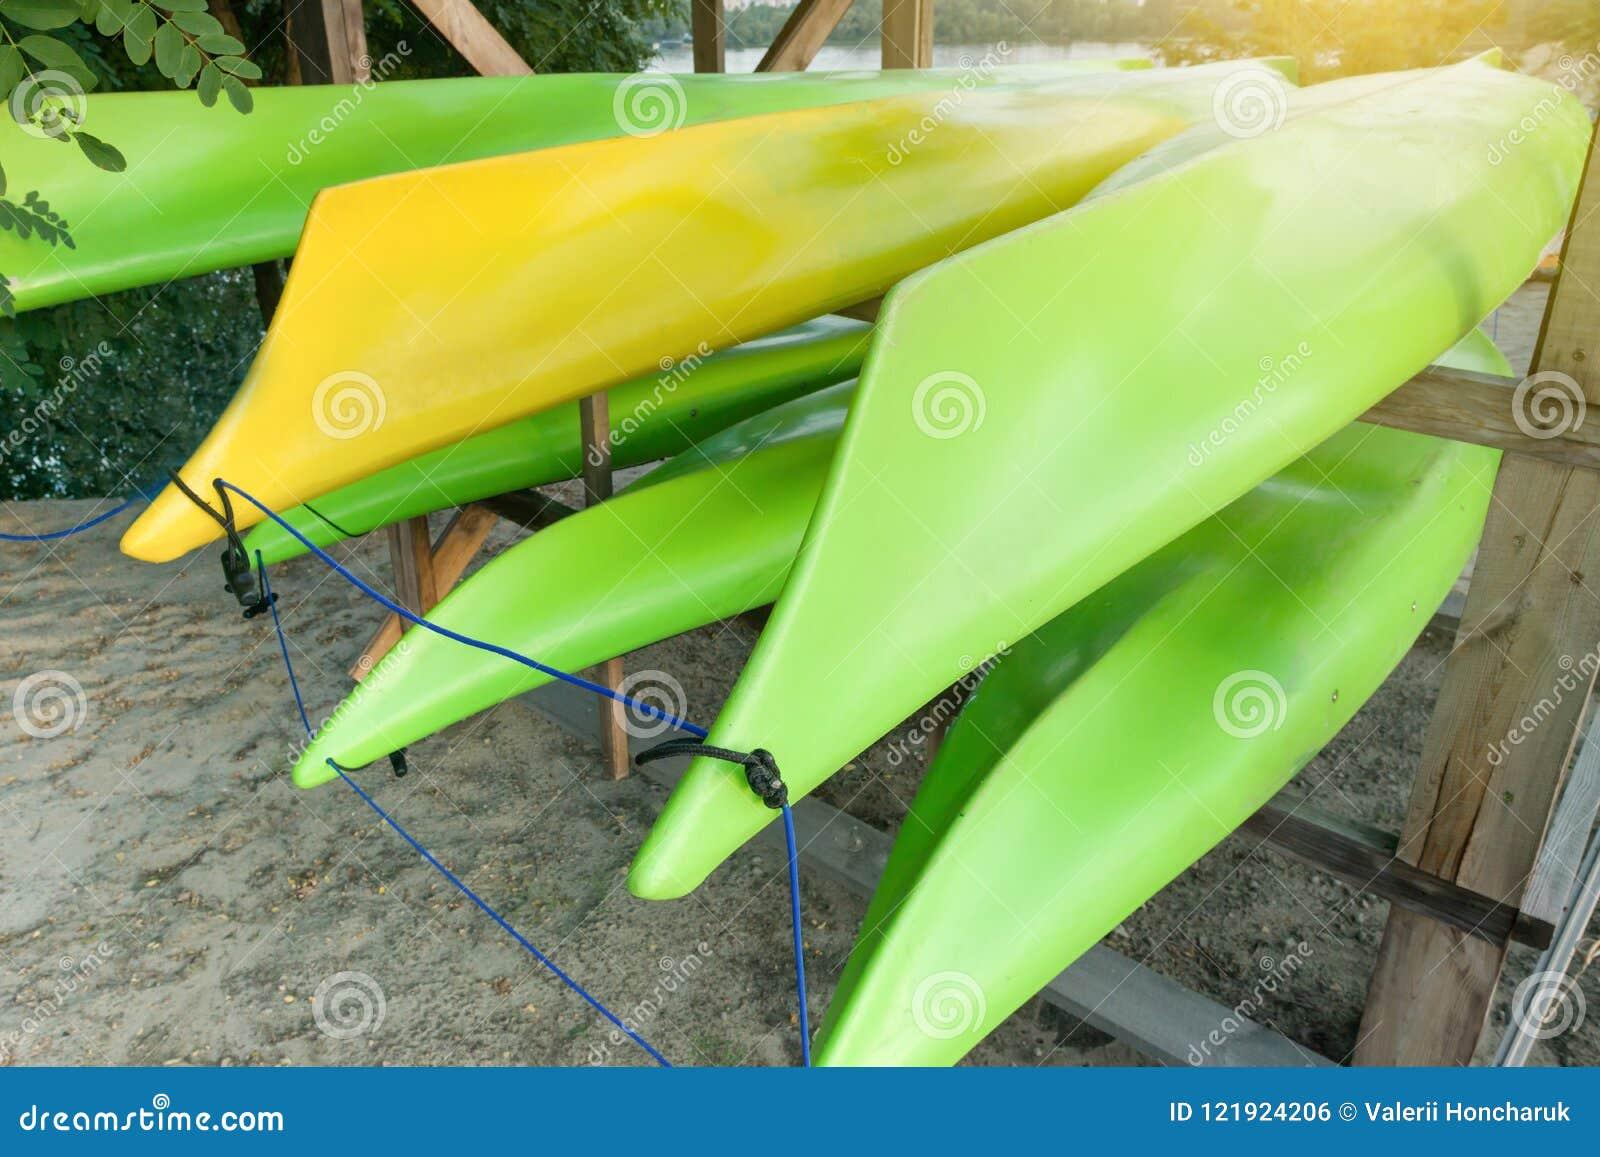 Boats Kayak, Canoe, Kayaks  On The River Bank, Storage